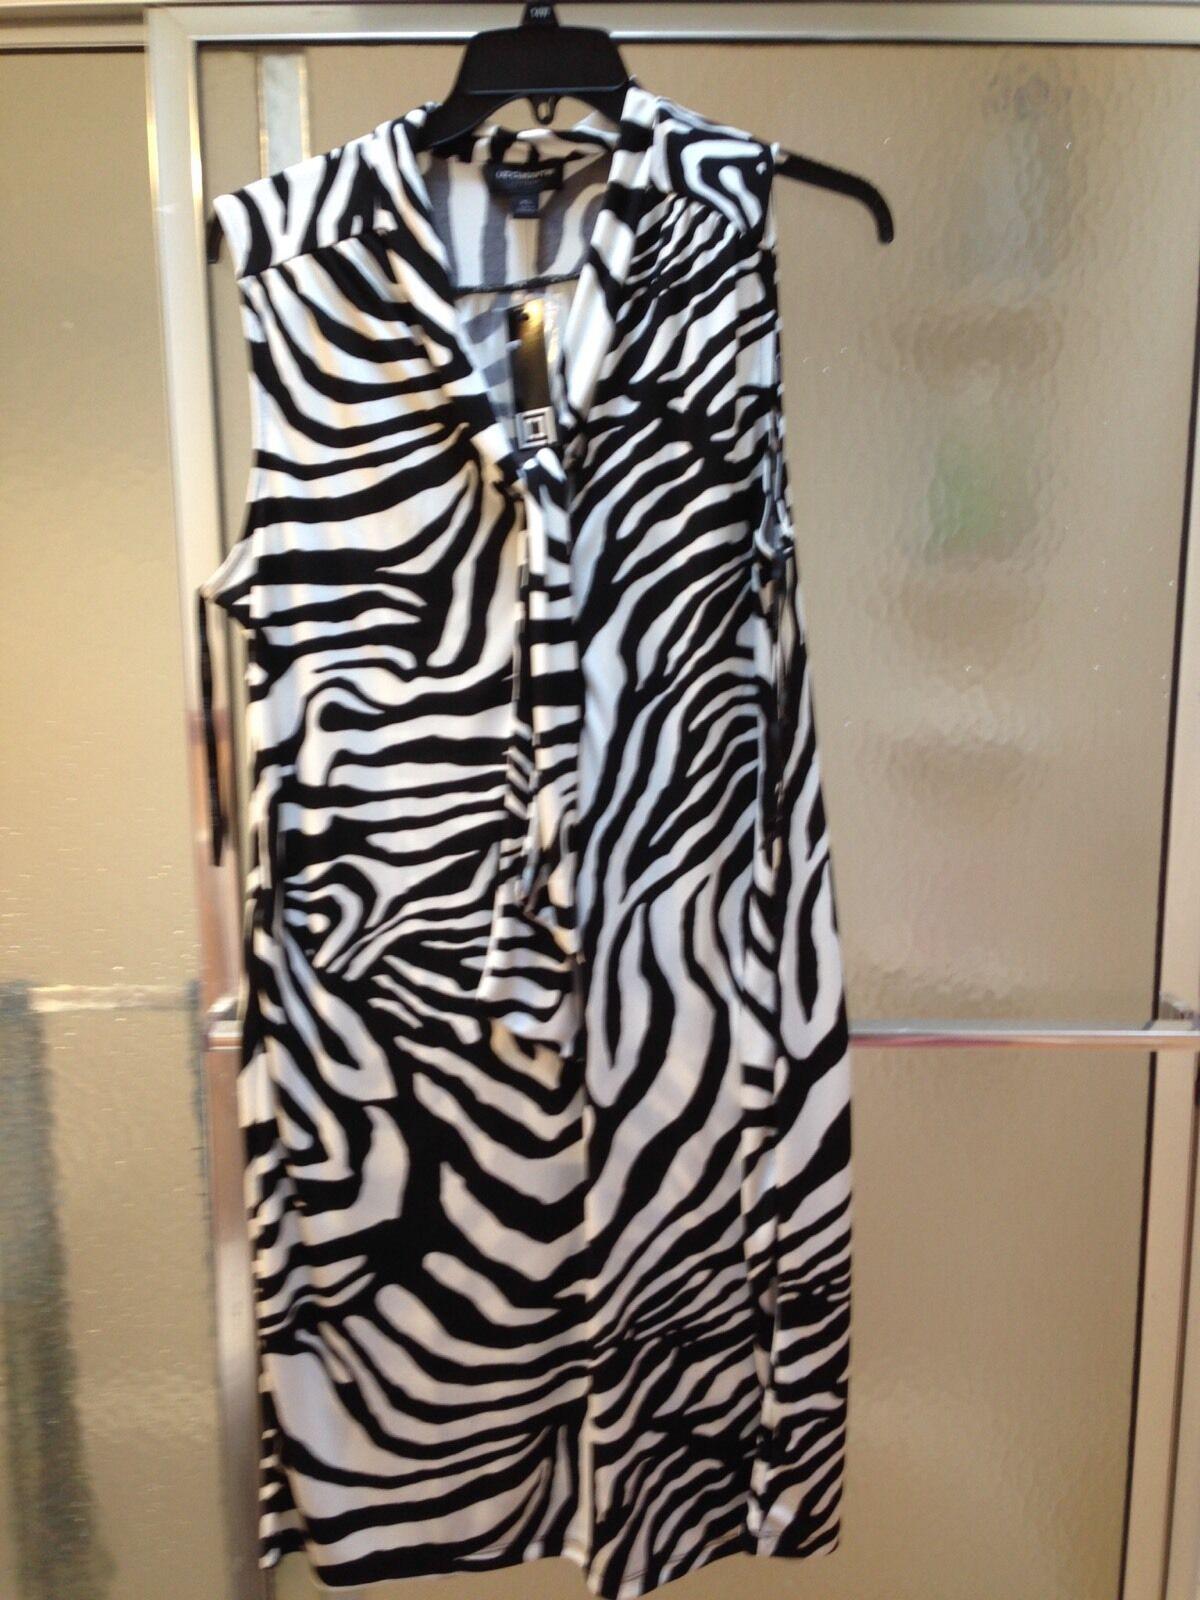 NWT Liz Claiborne schwarz Cream ColGoldt Shirt Dress;XL; Sleeveless; KneeLength;